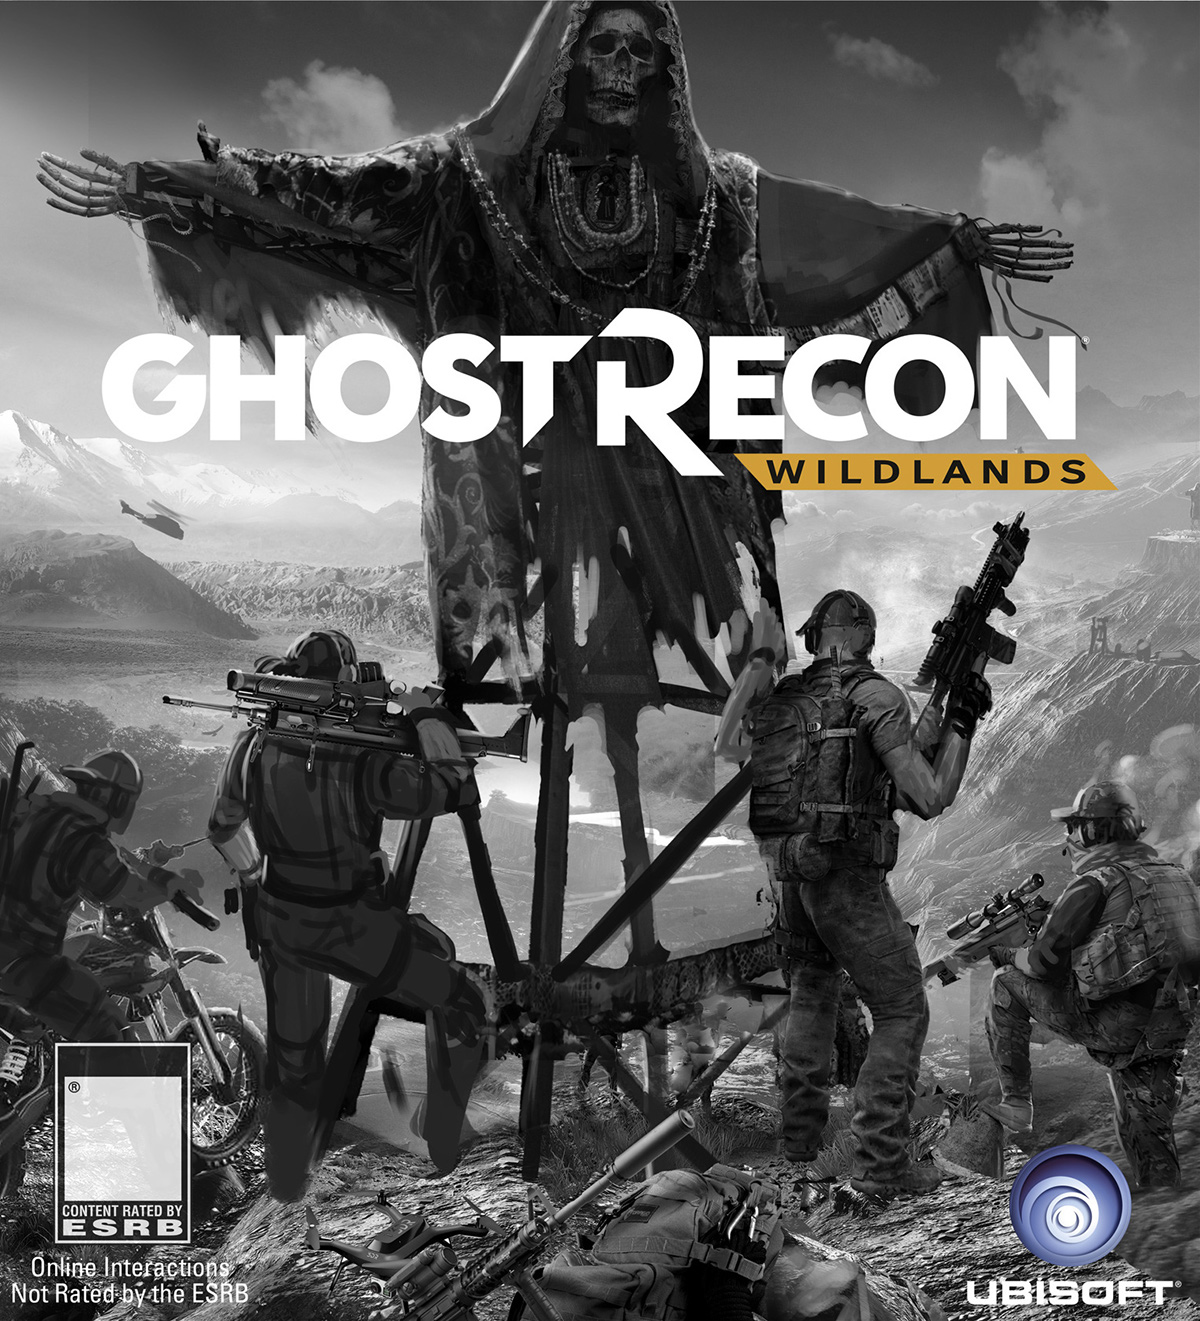 Ghost Recon wildlands ubisoft video game Pack santa muerte videogame game Tom Clancy